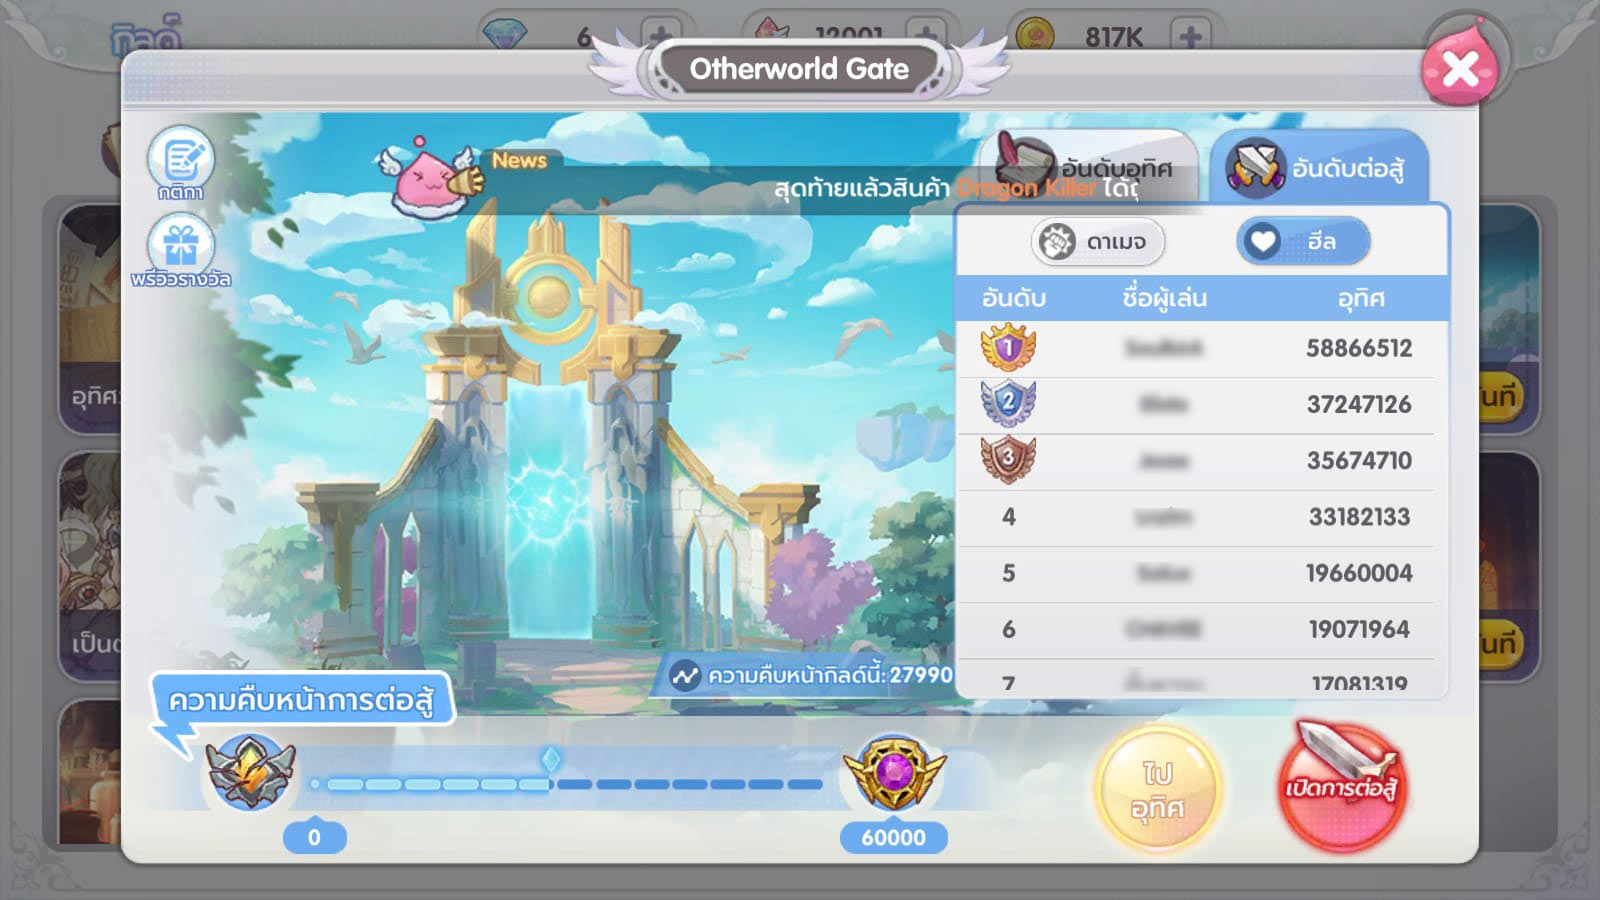 ROX - Otherworld Gate 05